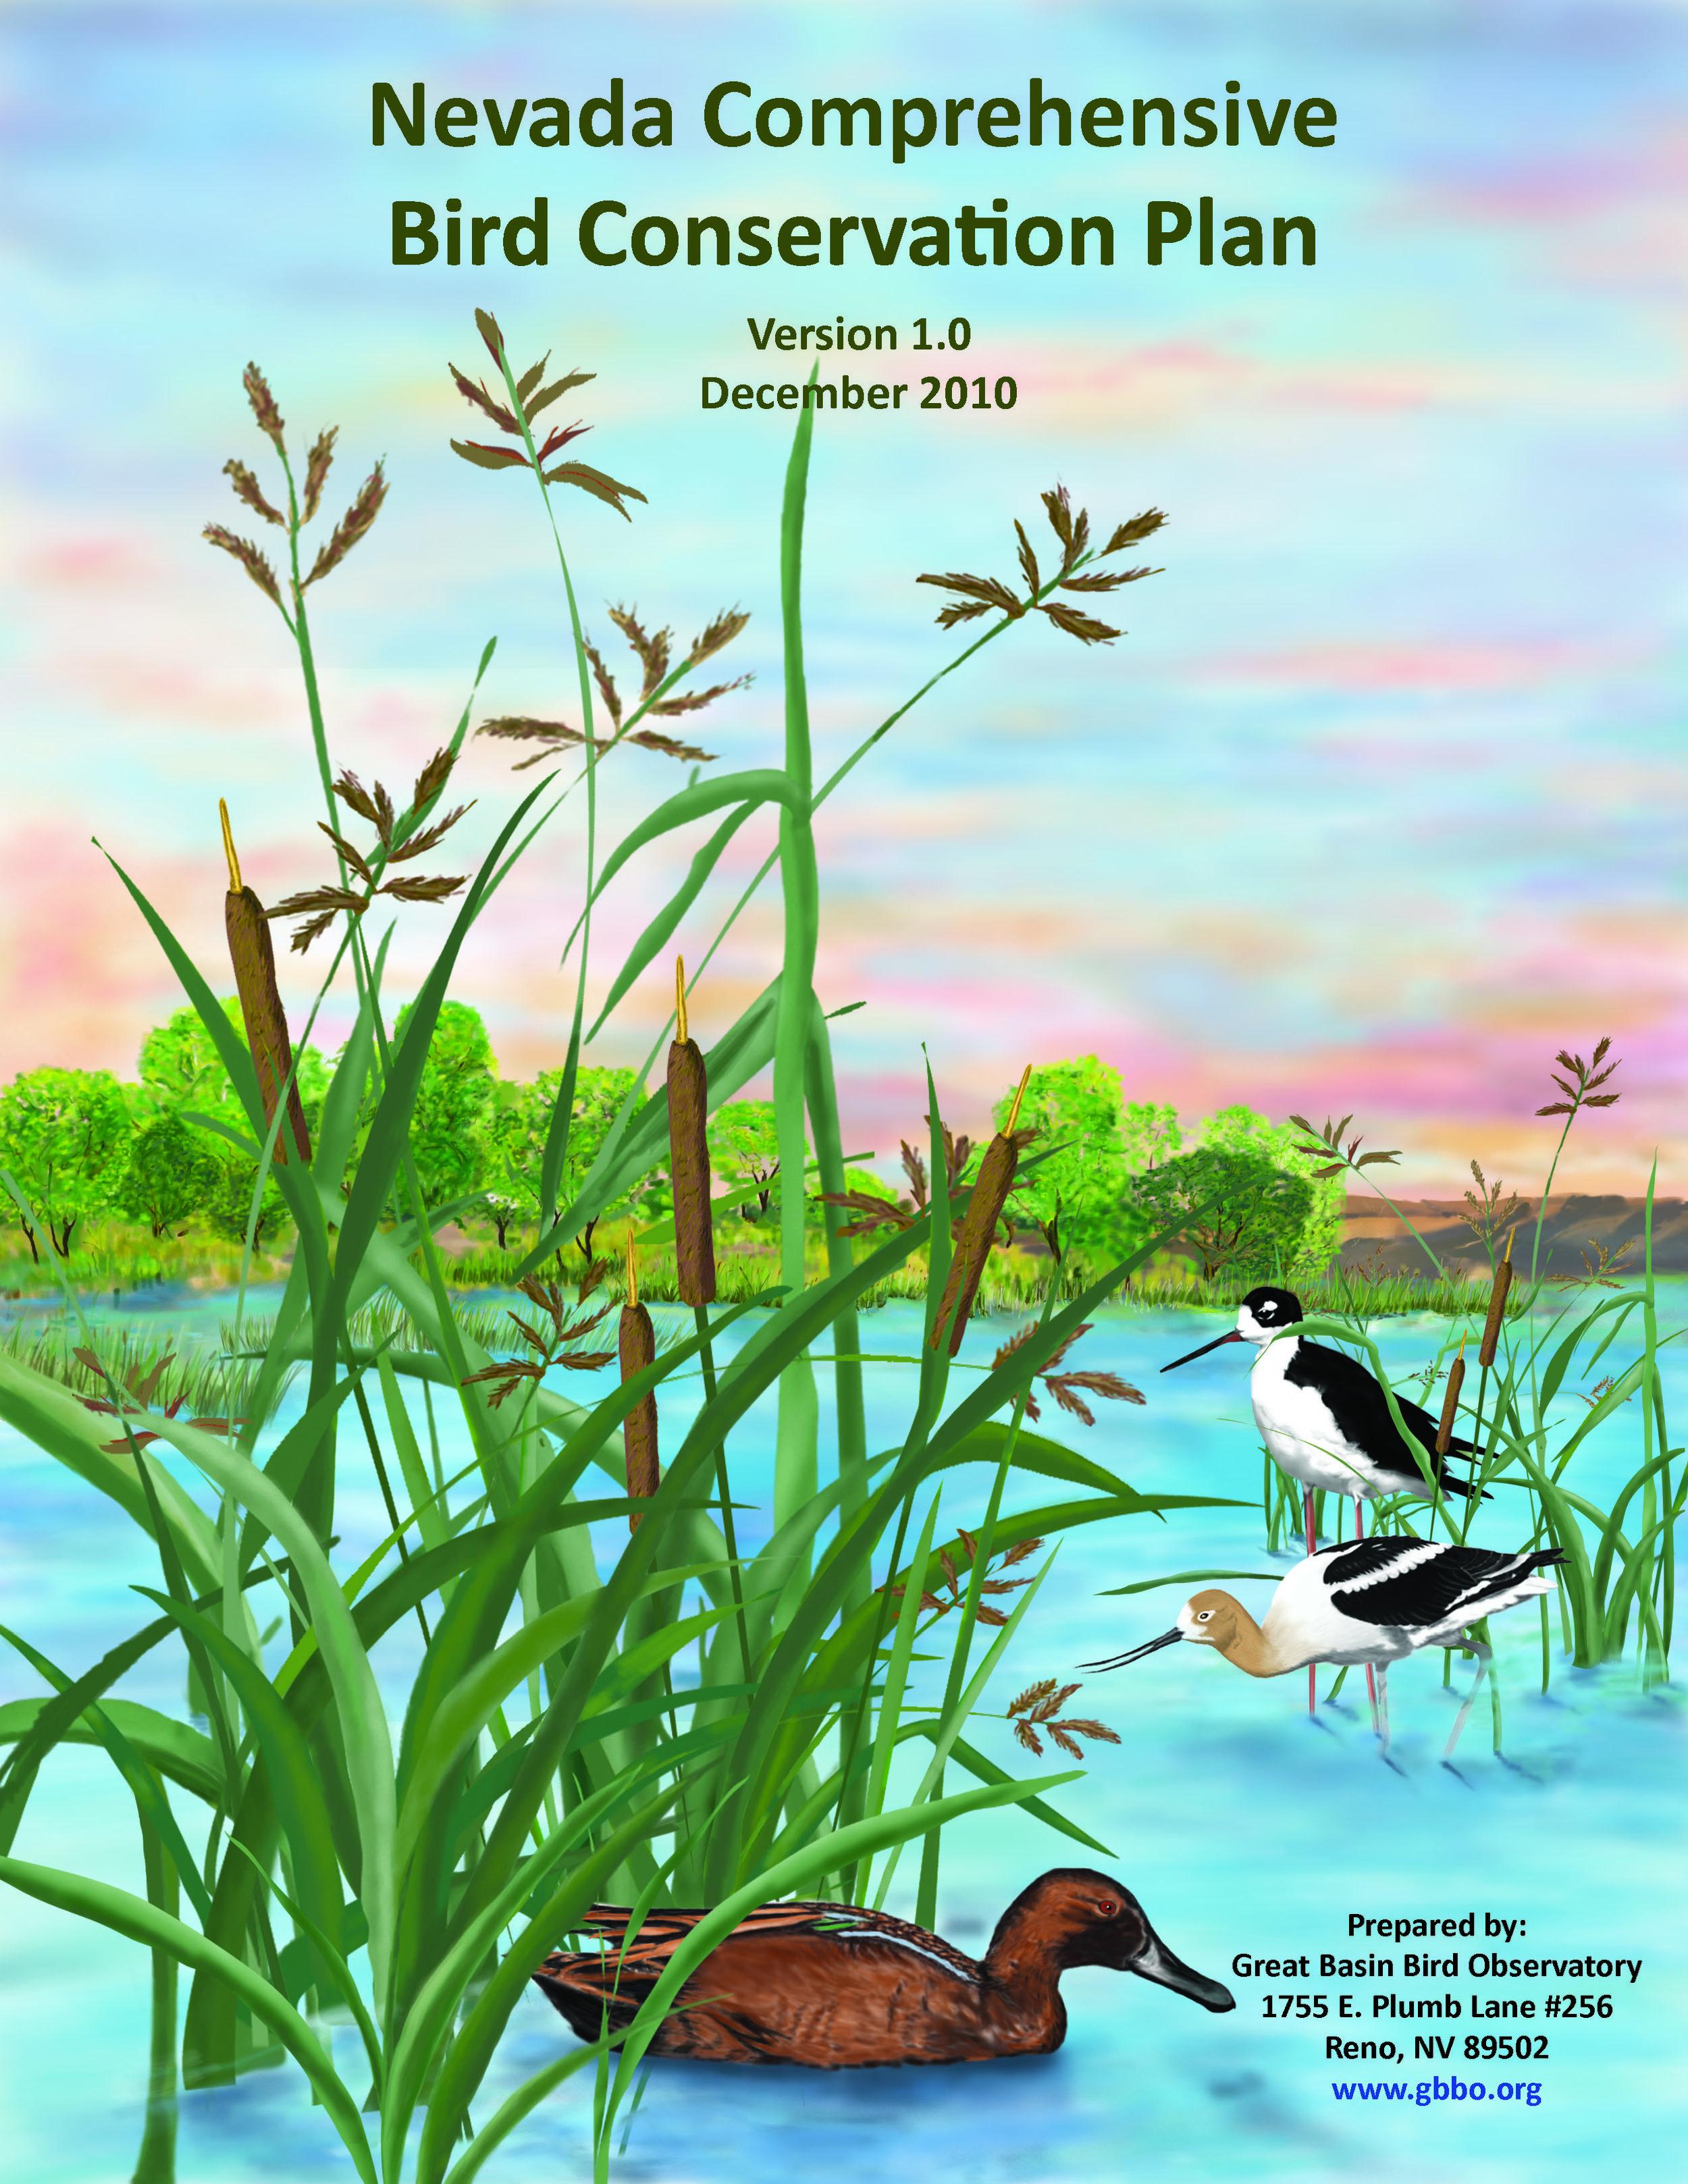 Nevada Comprehensive Bird Conservation Plan